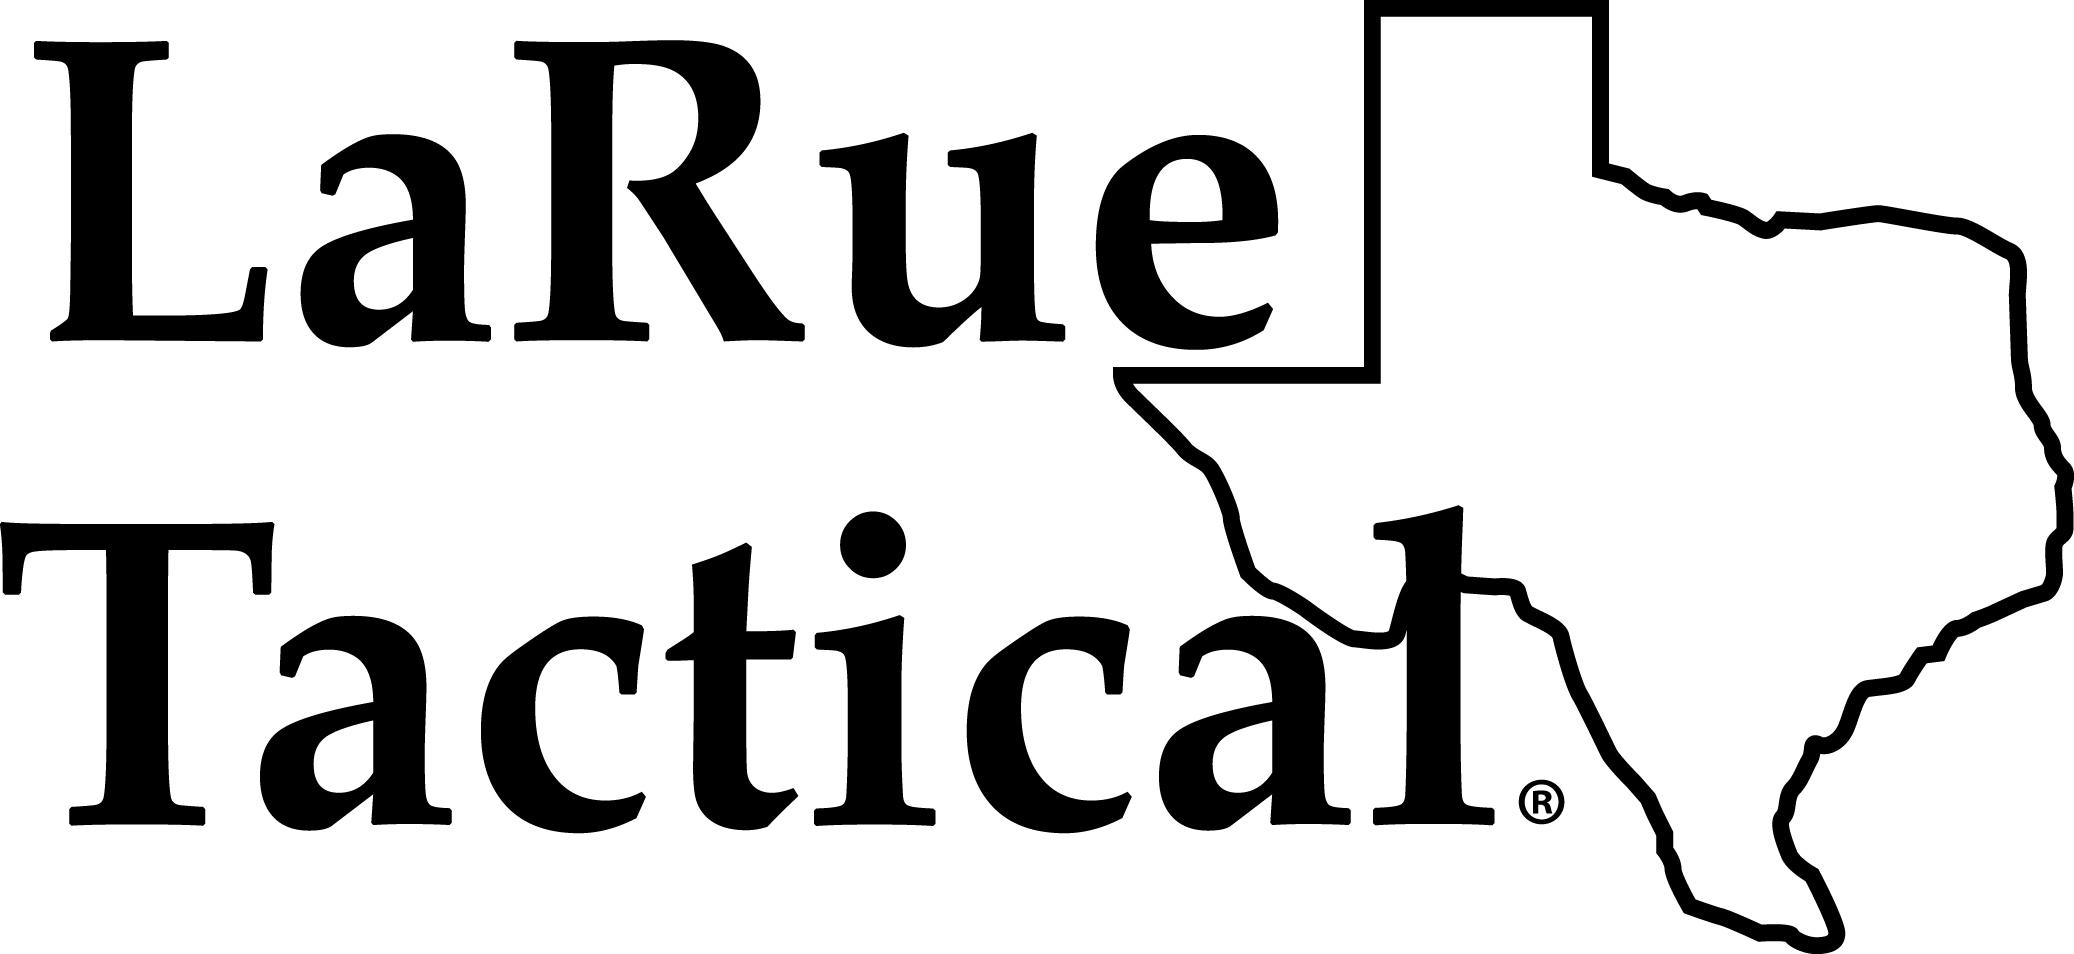 Mark Larue I M Pro 2nd Amendment And Pro Bumpfire Stocks